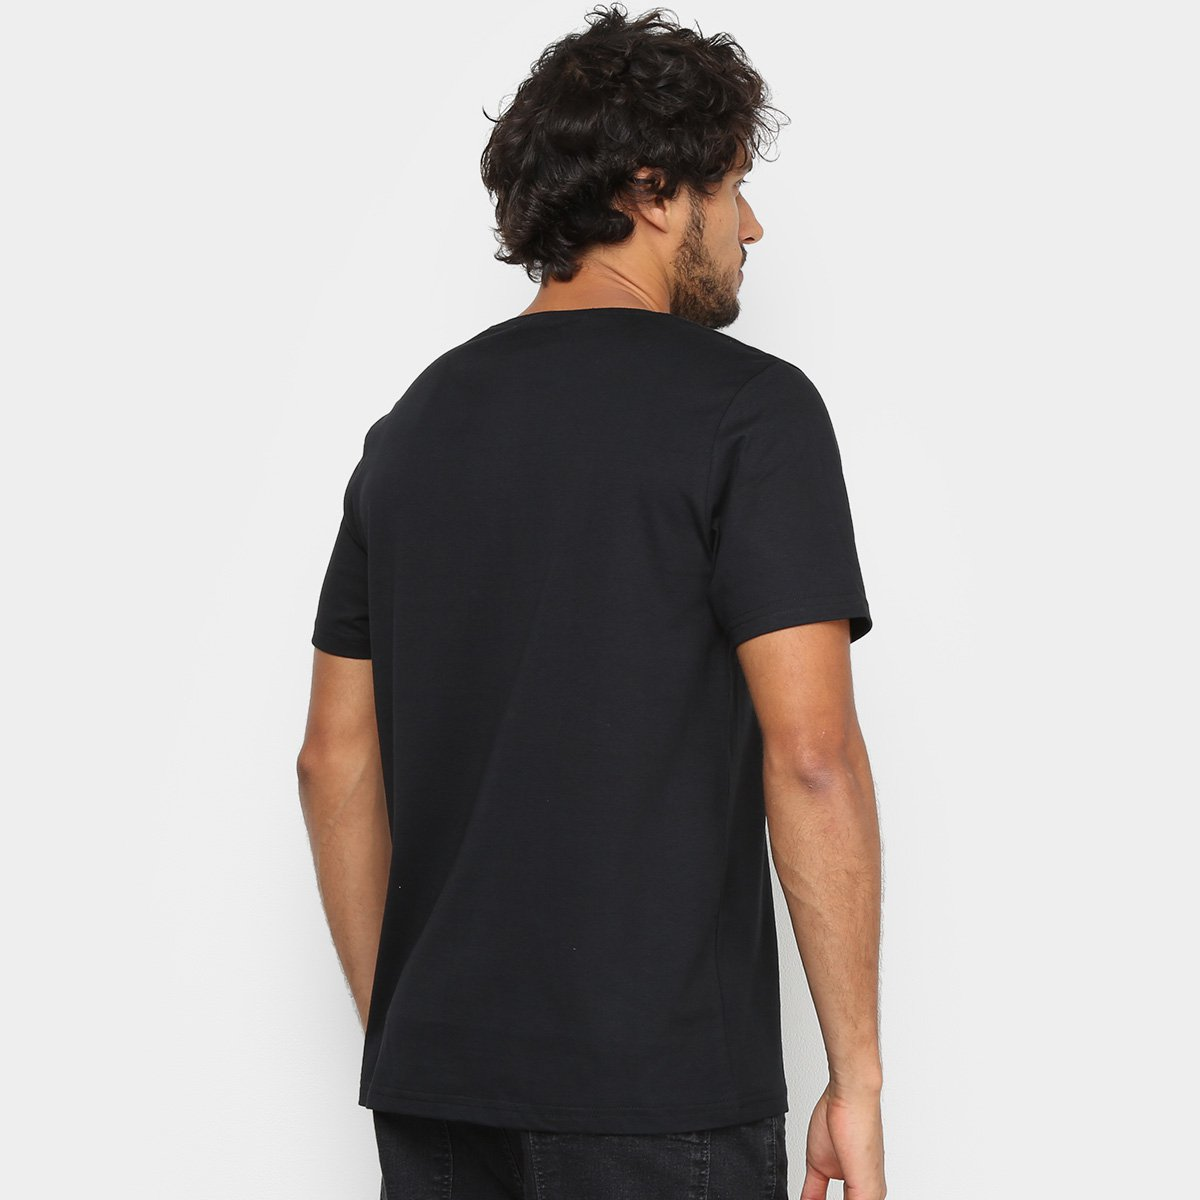 Kit Camiseta Básica c/ 5 Peças Masculinas - Tam: G - 2